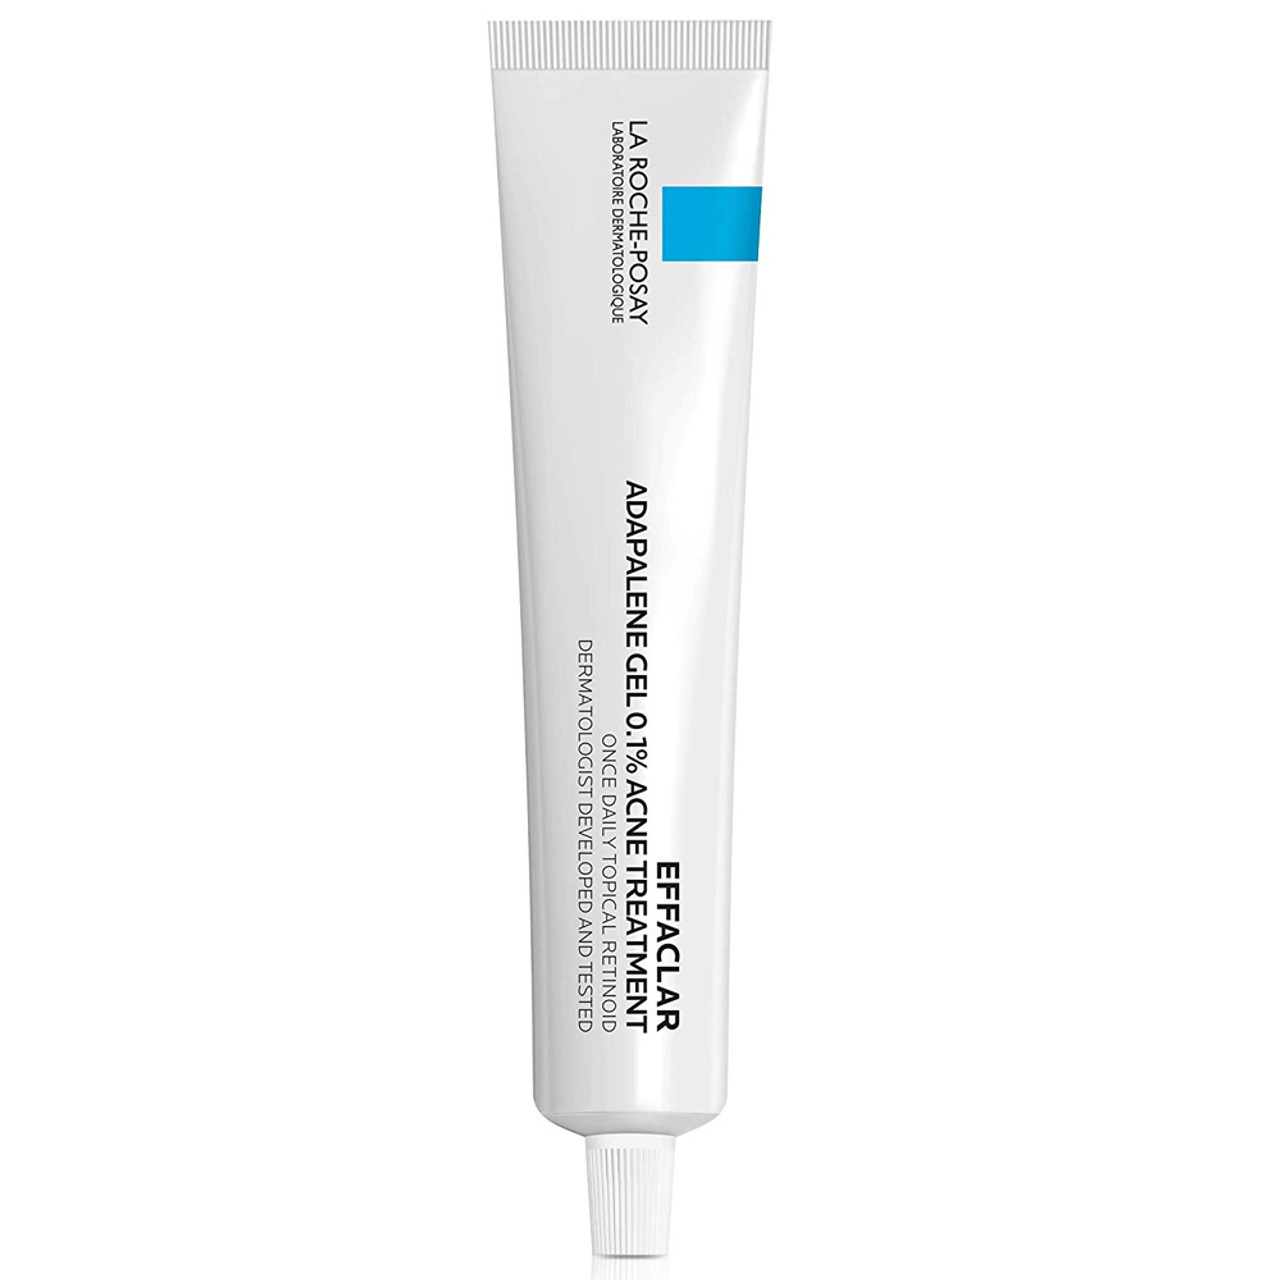 La Roche Posay Effaclar Adapalene Gel 0.1% Acne Treatment